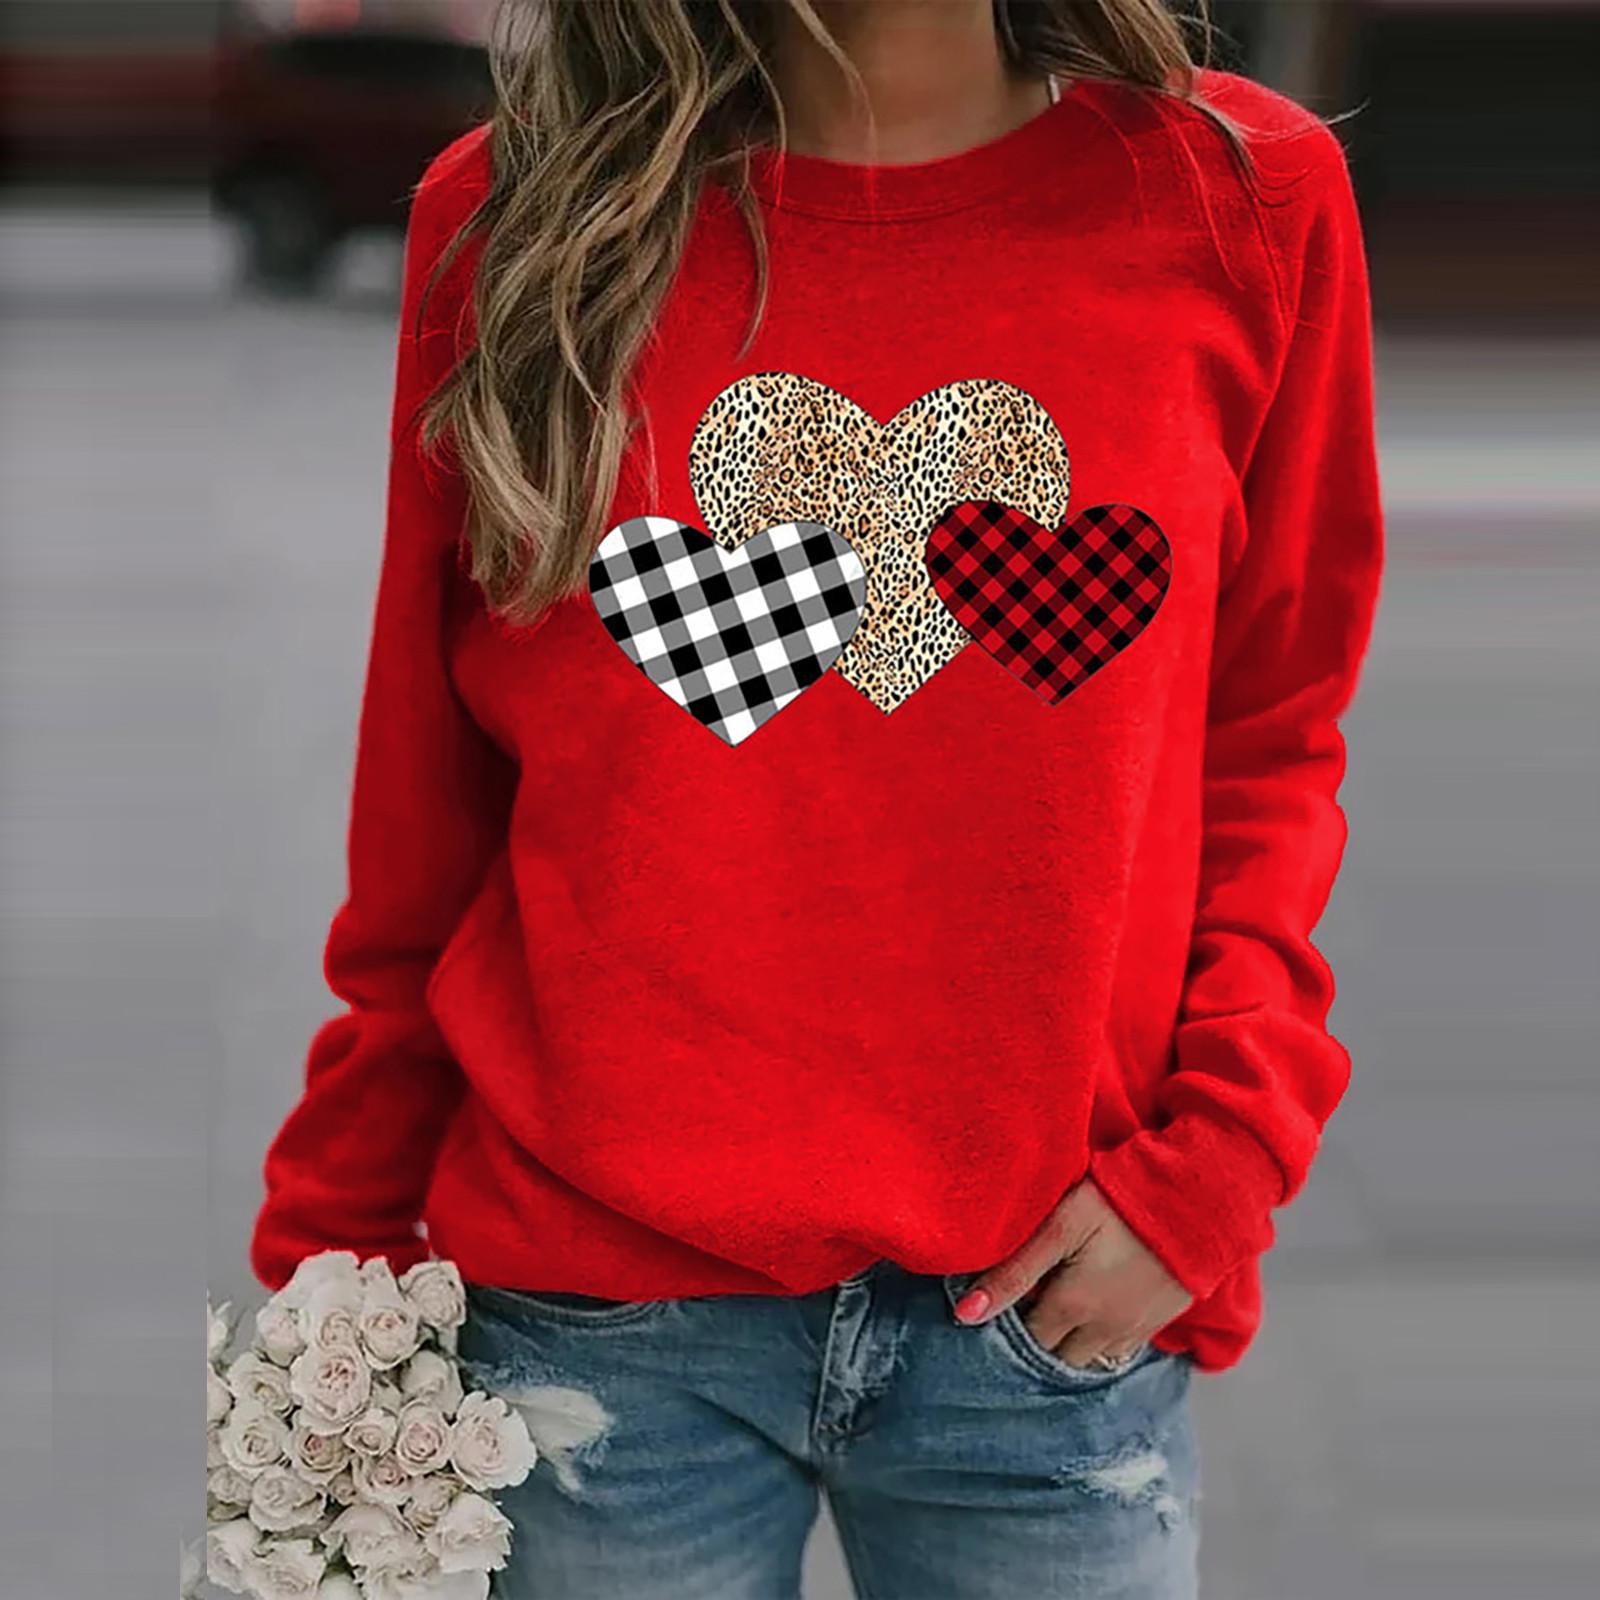 4# Women's Leopard Love Print Blouses Long Sleeve Printed Loosen Tops Shirts 2020 Fashion Women Blouses Shirt Рубашка Женская